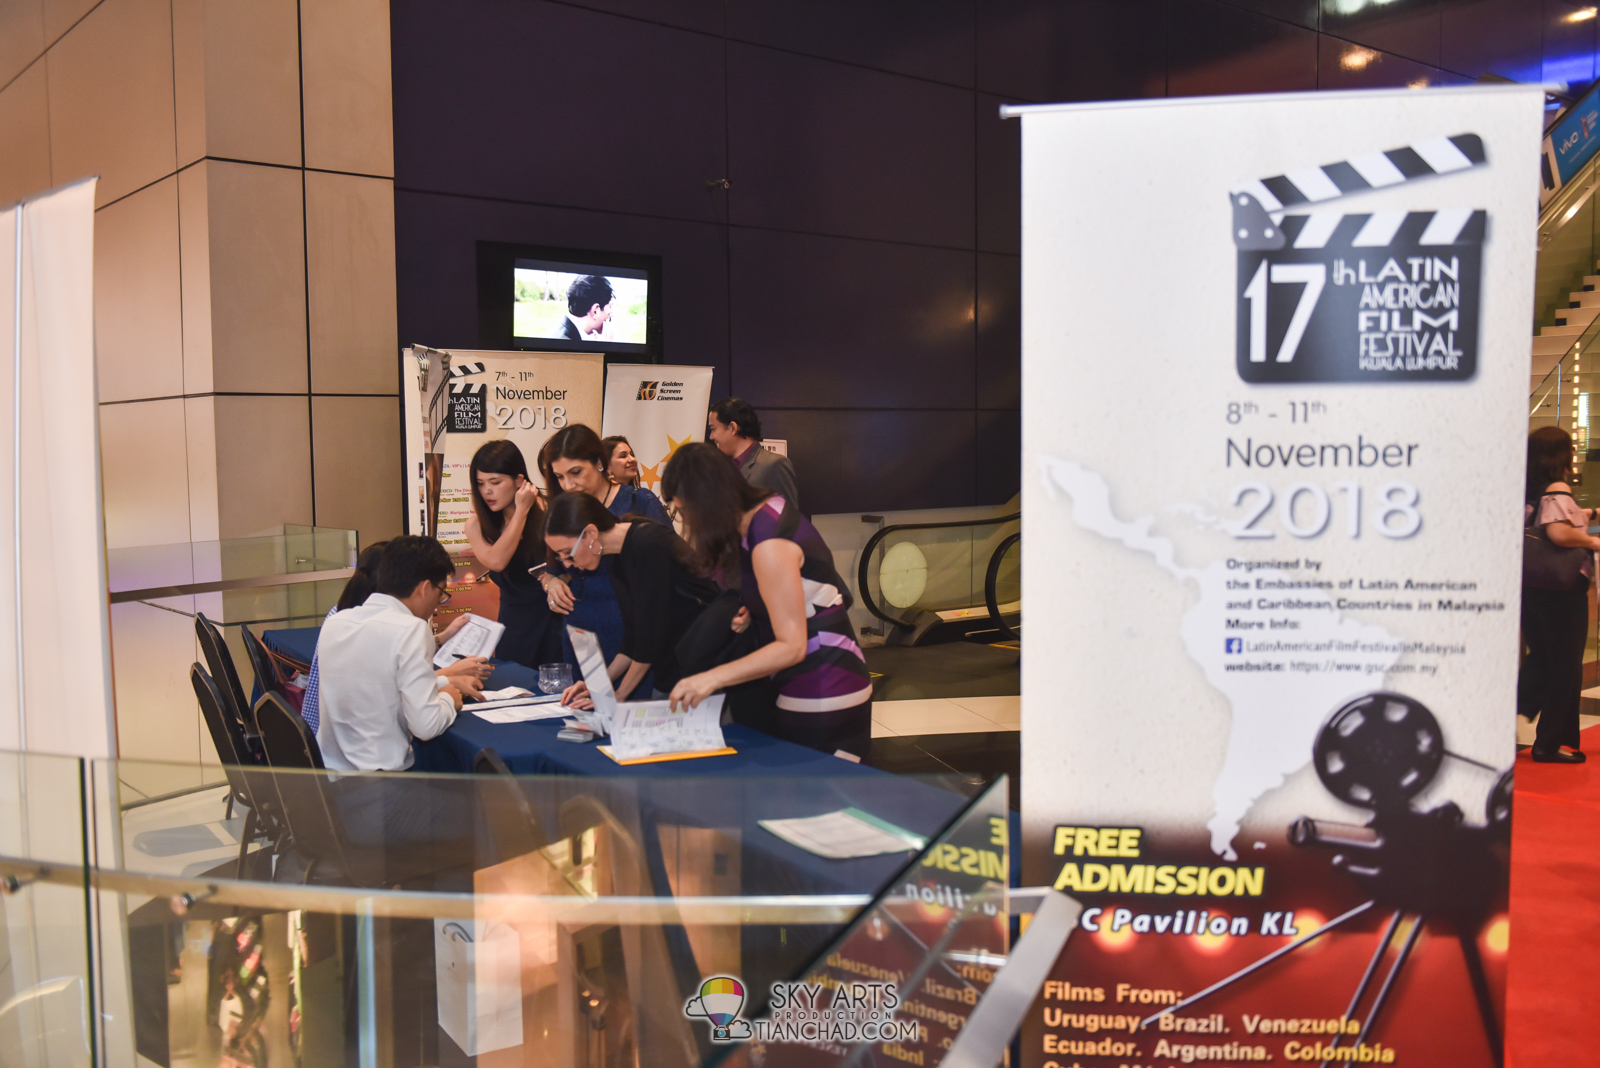 Photo] 17th Latin American Film Festival 2018 in Malaysia